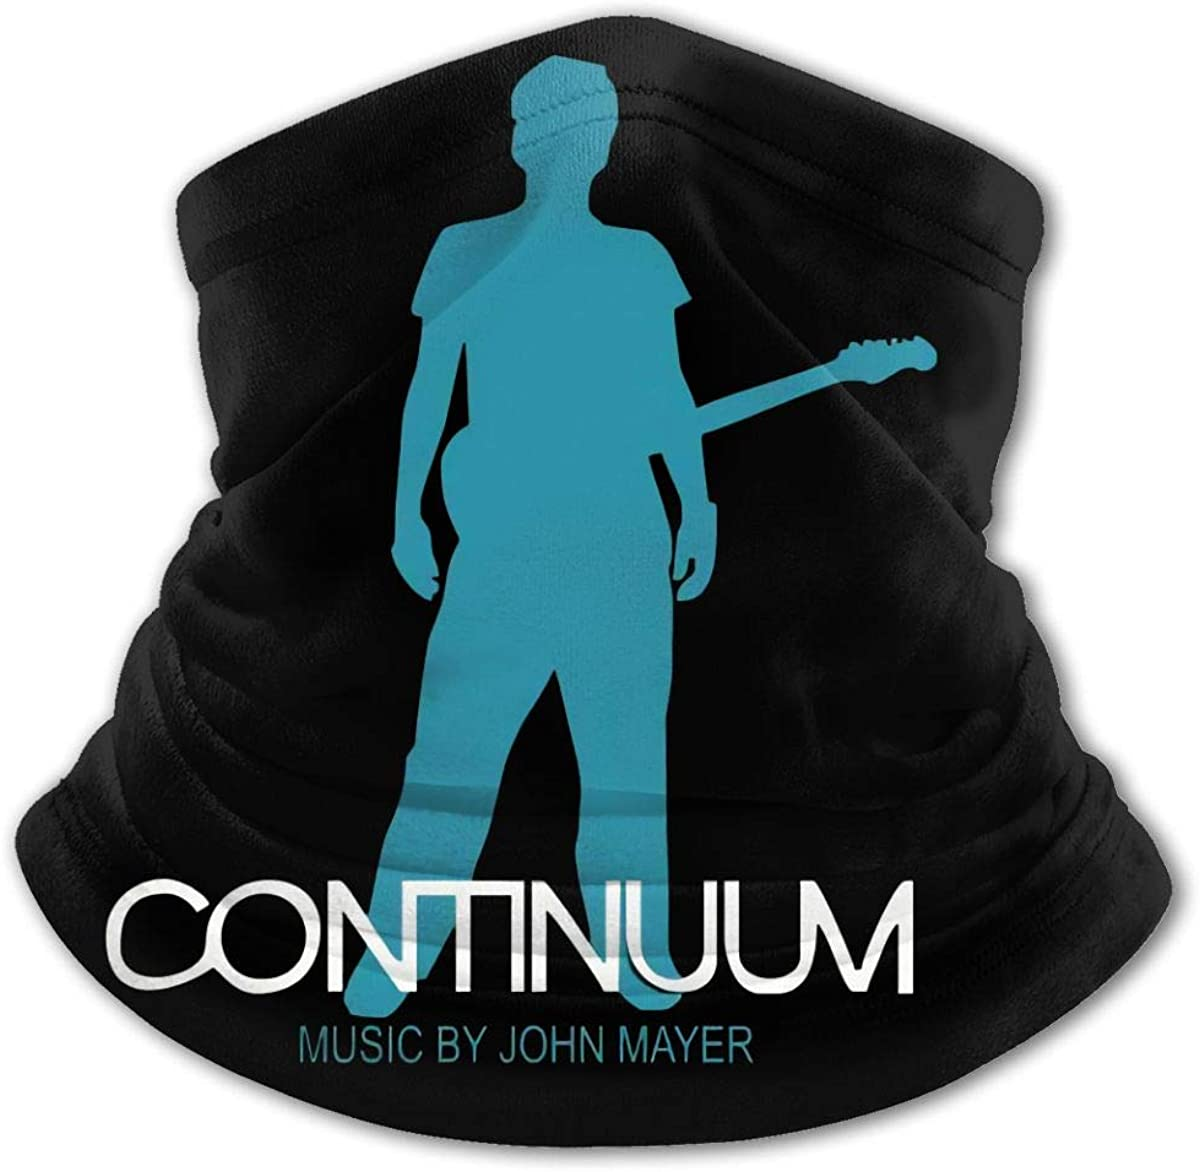 John Mayer Face Mask Balaclava Protection from Dust, Uv & Aerosols - Reusable Bandana Face Cover Black